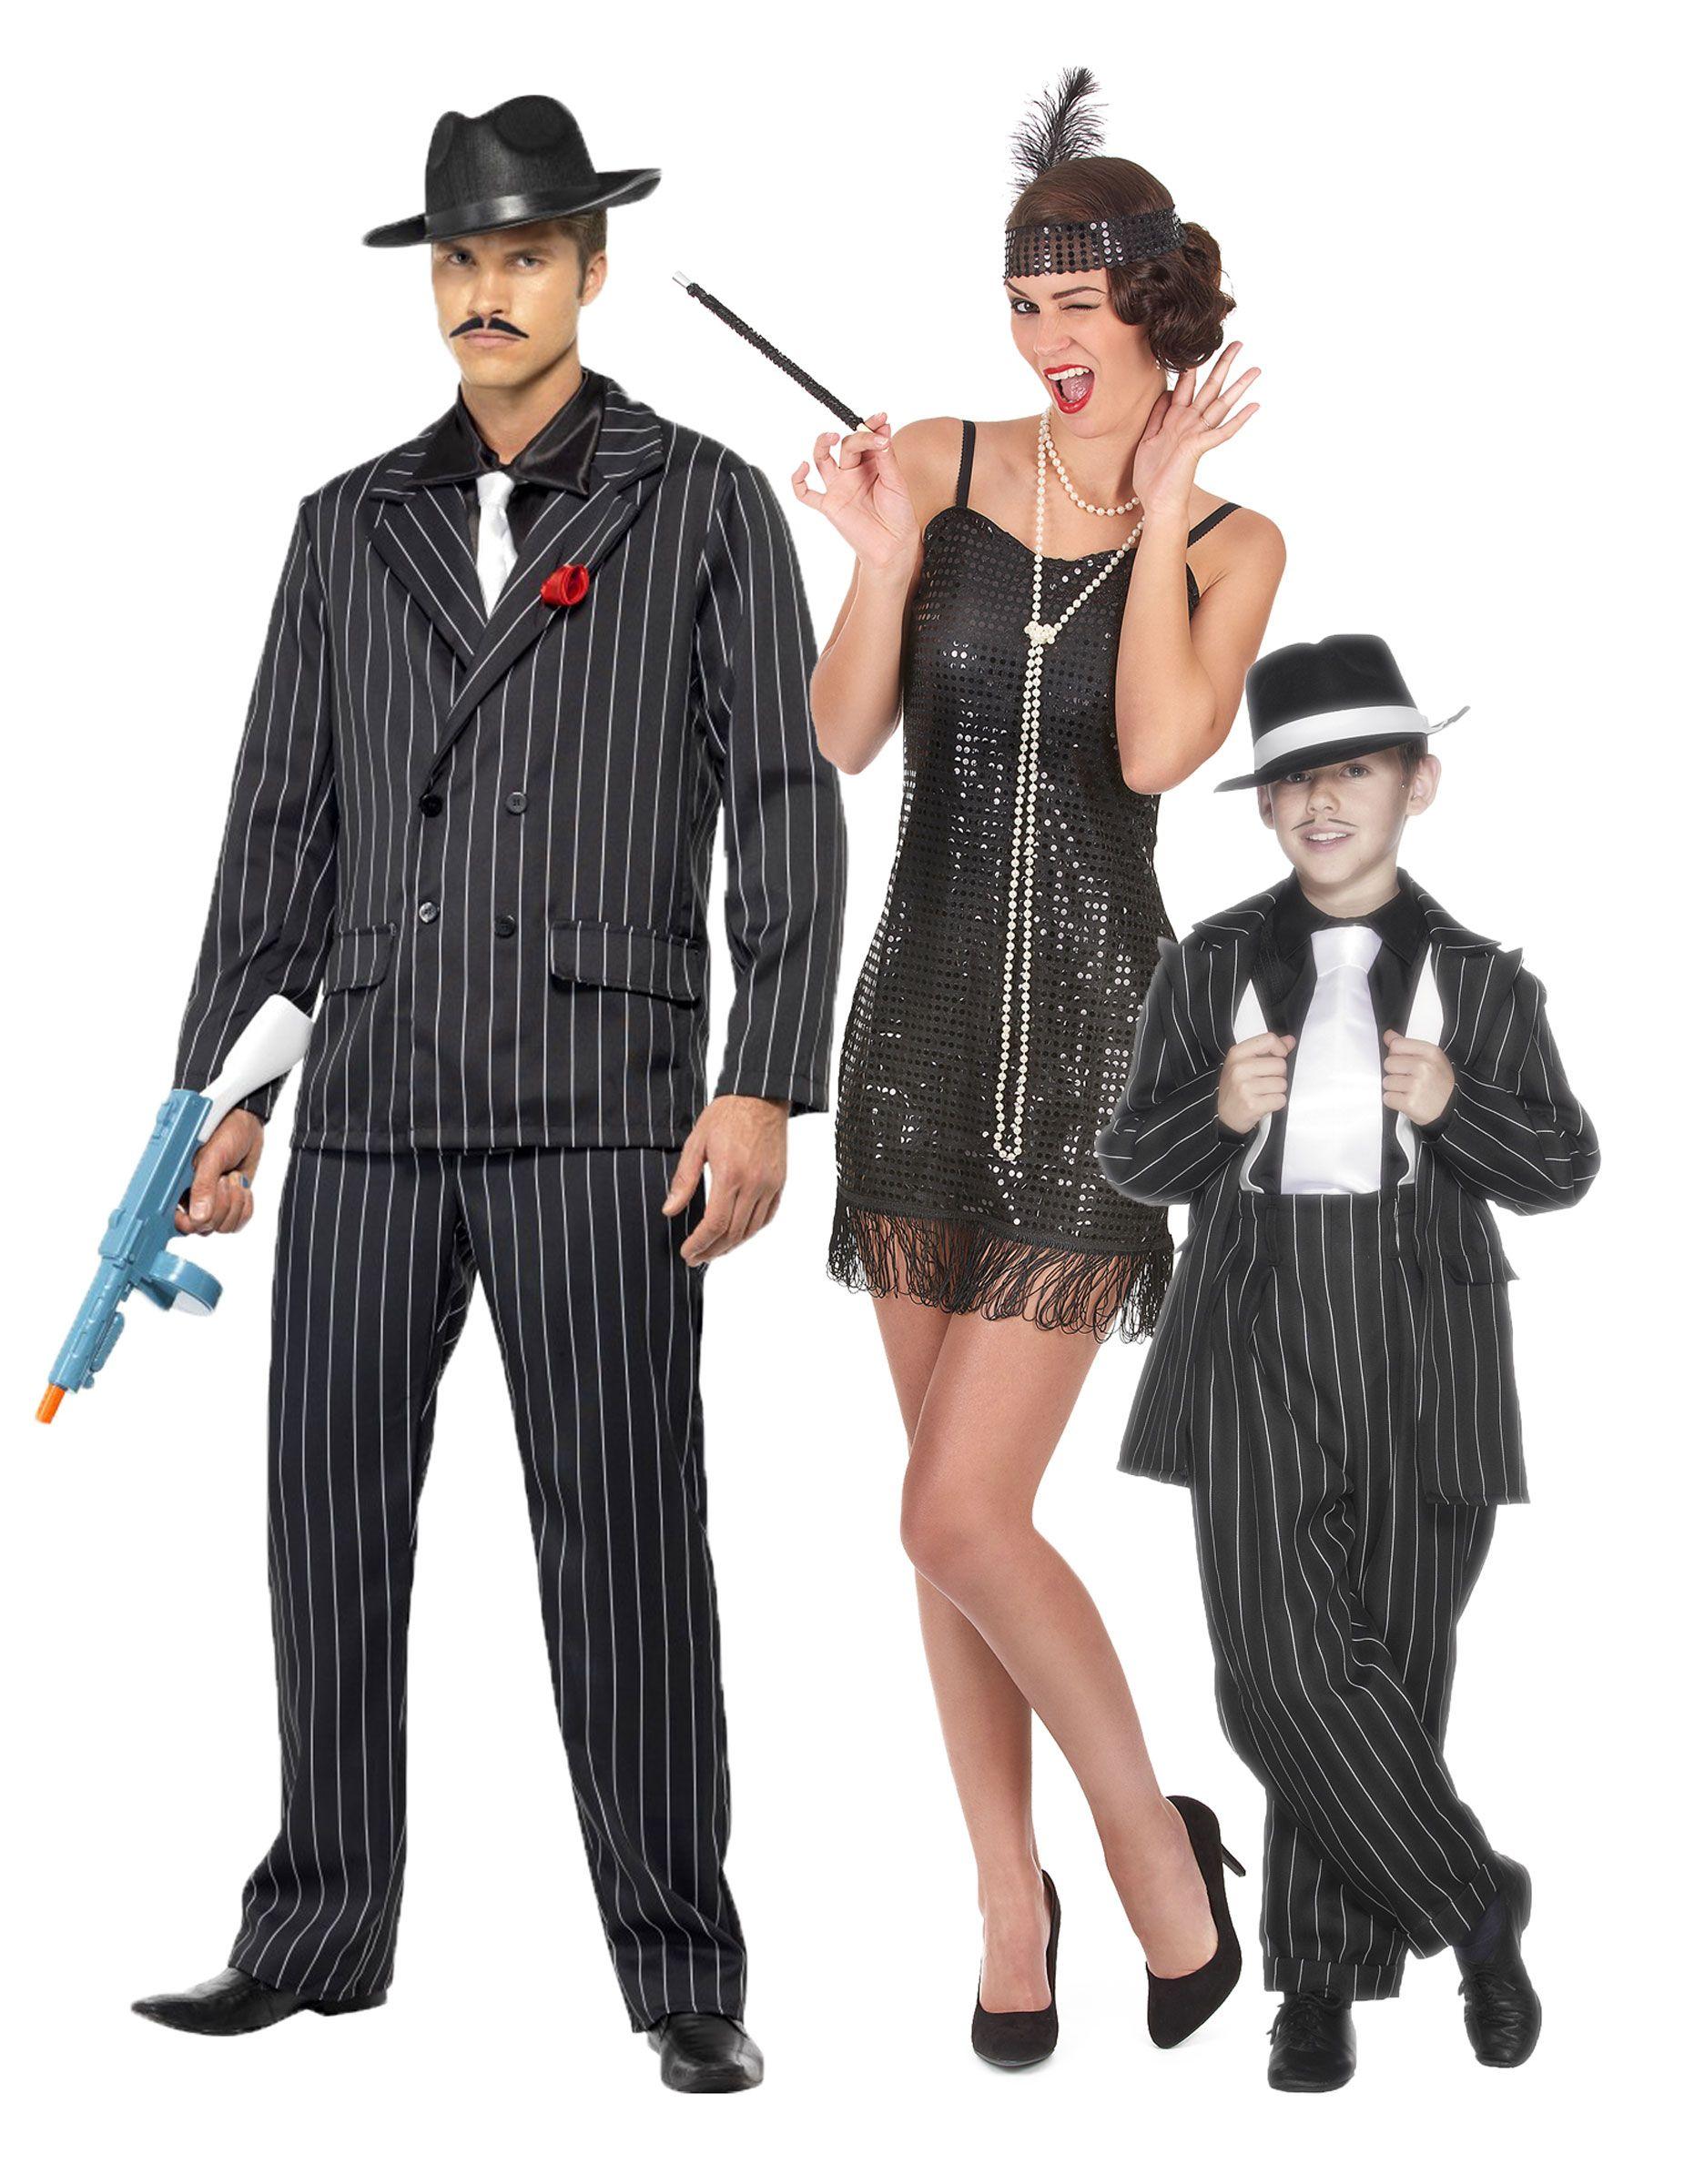 Disfraz de familia charleston gangster  Disfraz de gánster para hombreEste  disfraz de mafiosos a rayas negras para hombre incluye cuatro elementos   una ... f7312a2dc1d